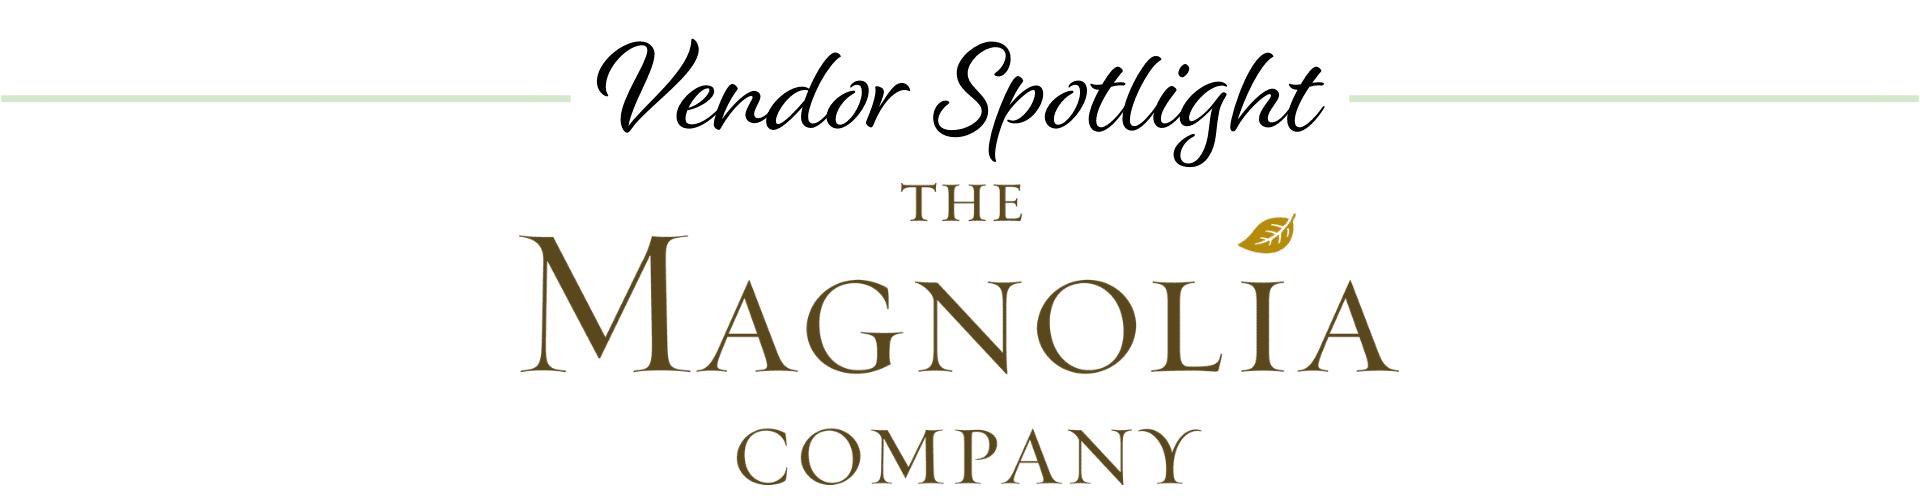 The Magnolia Company logo